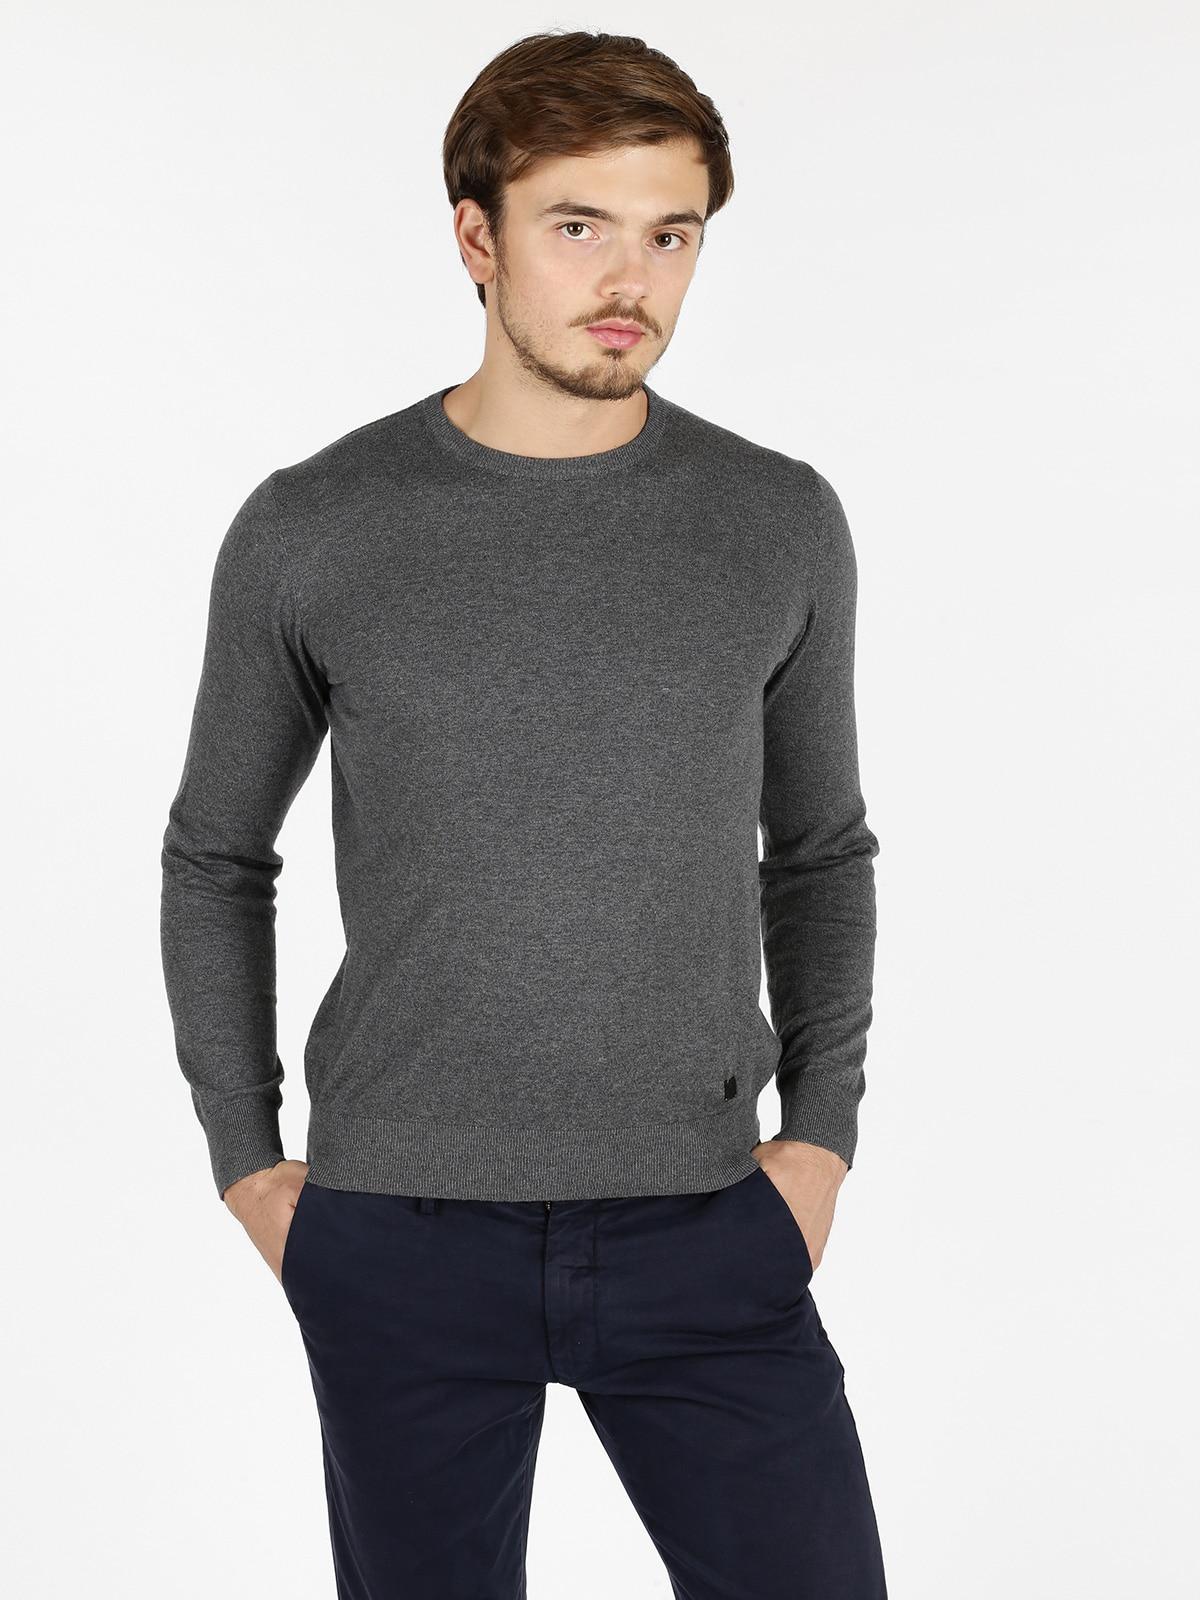 Cotton And Cashmere Sweater Round Neck-dark Gray